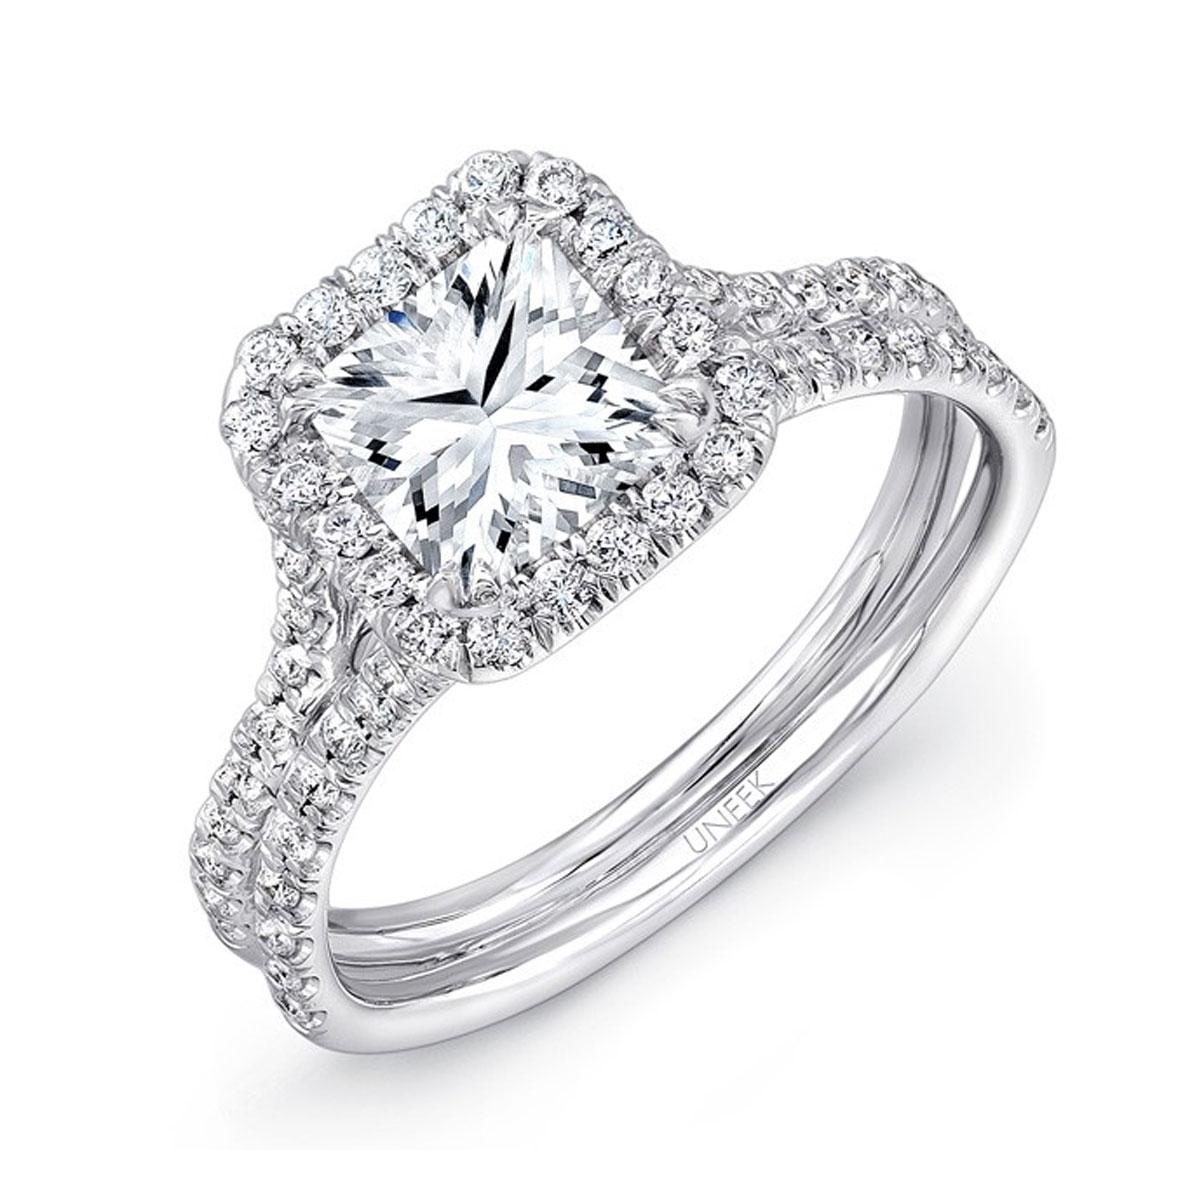 Uneek LVS899 052ctw Diamond Square Halo Engagement Ring